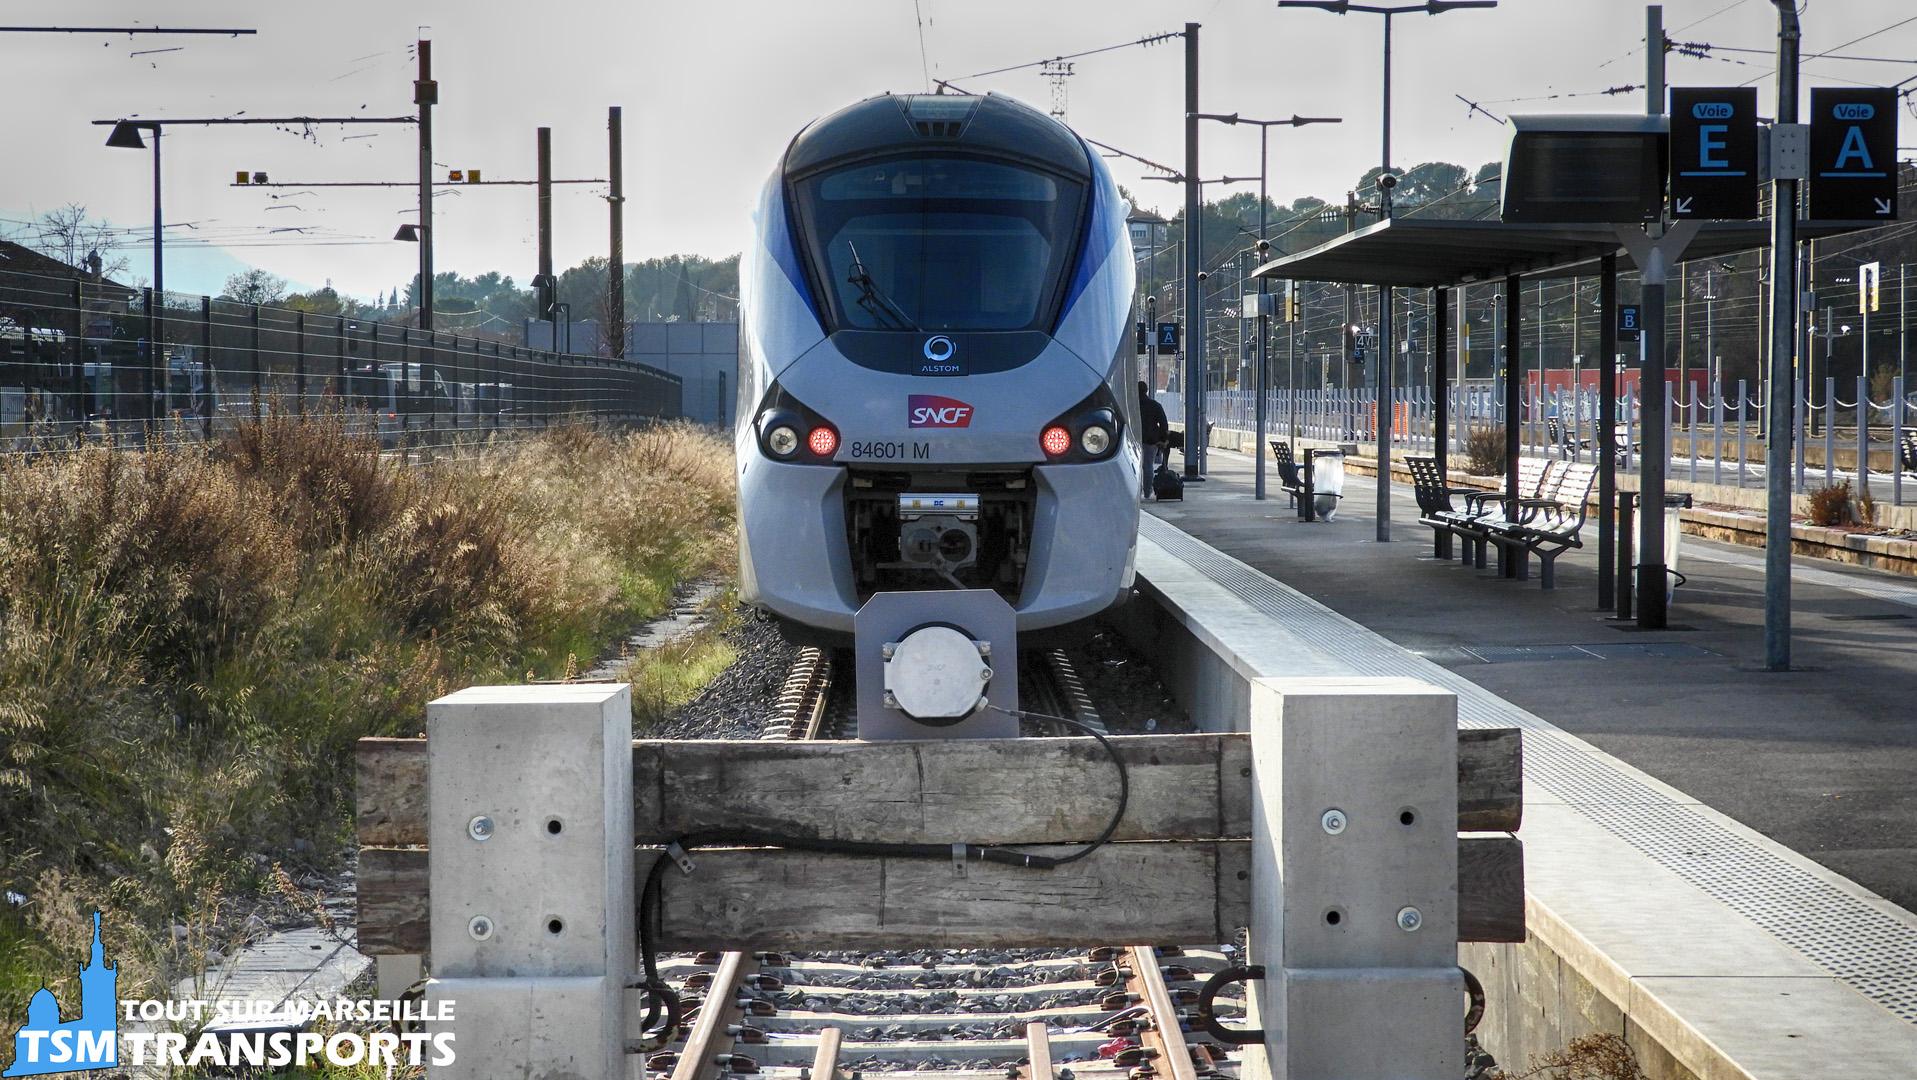 Alstom Régiolis SNCF n°B84601 en gare d'Aubagne